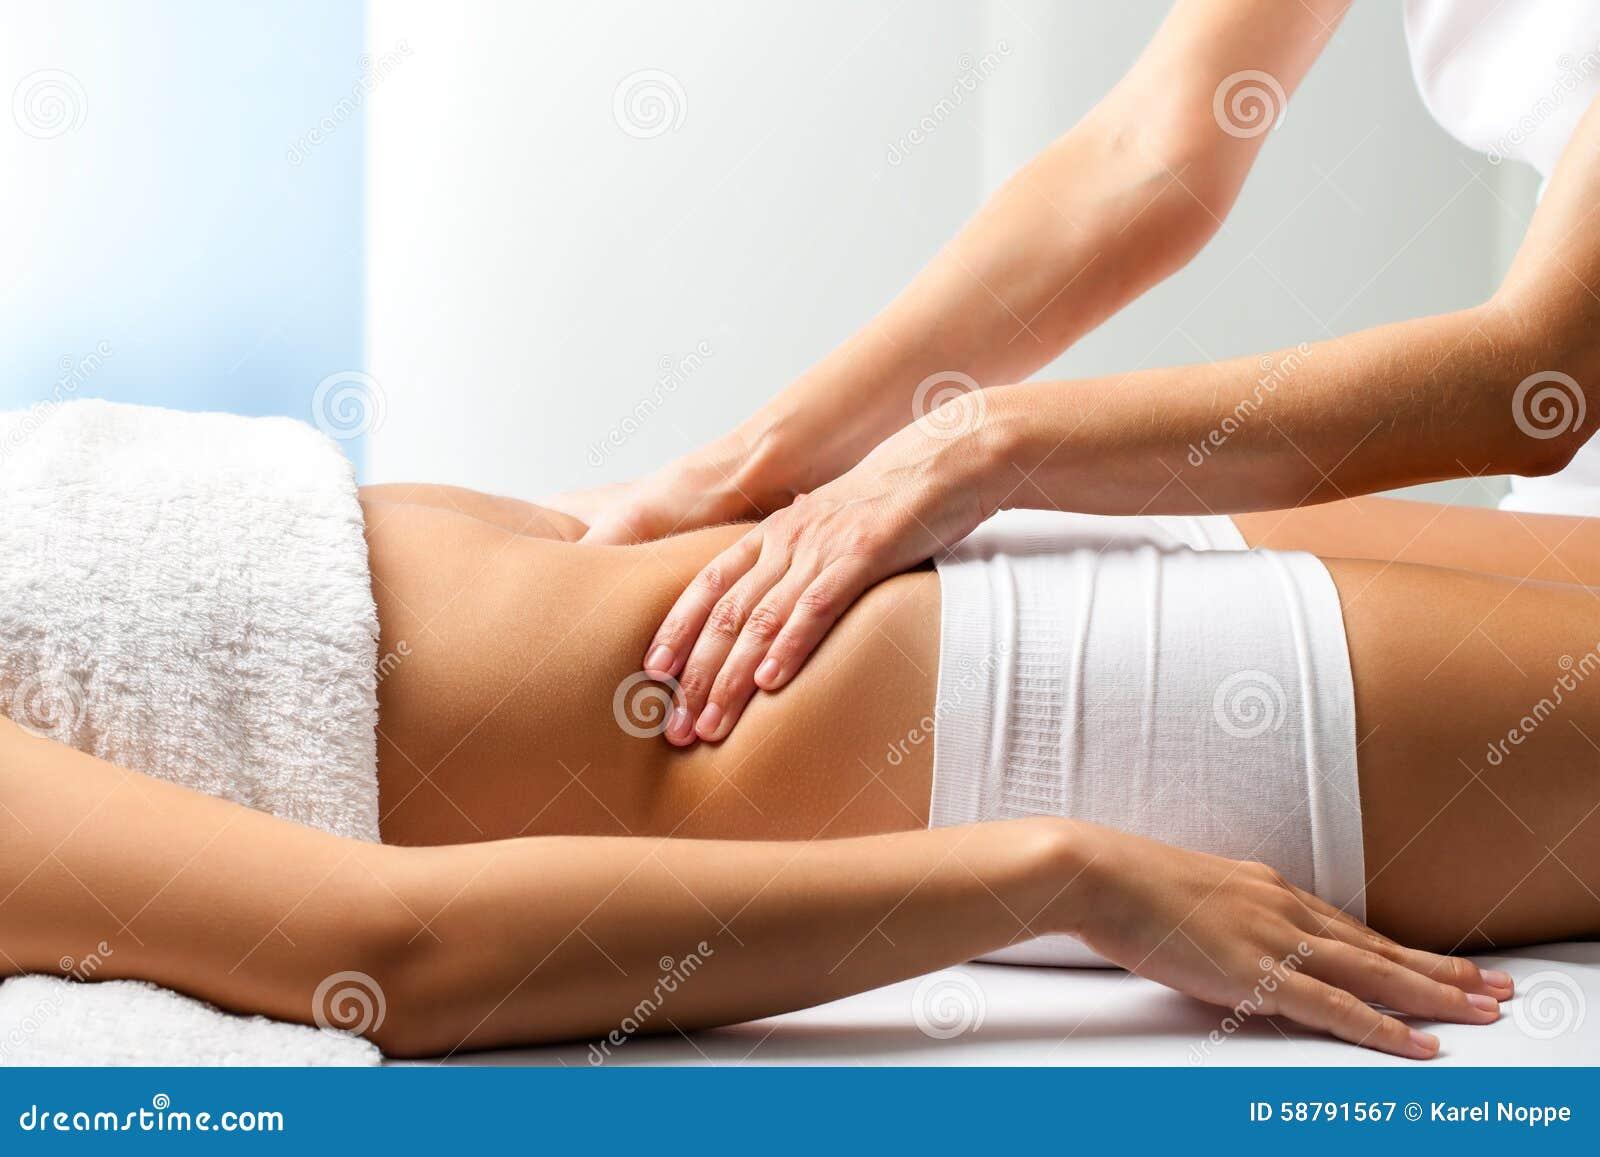 skin therapist